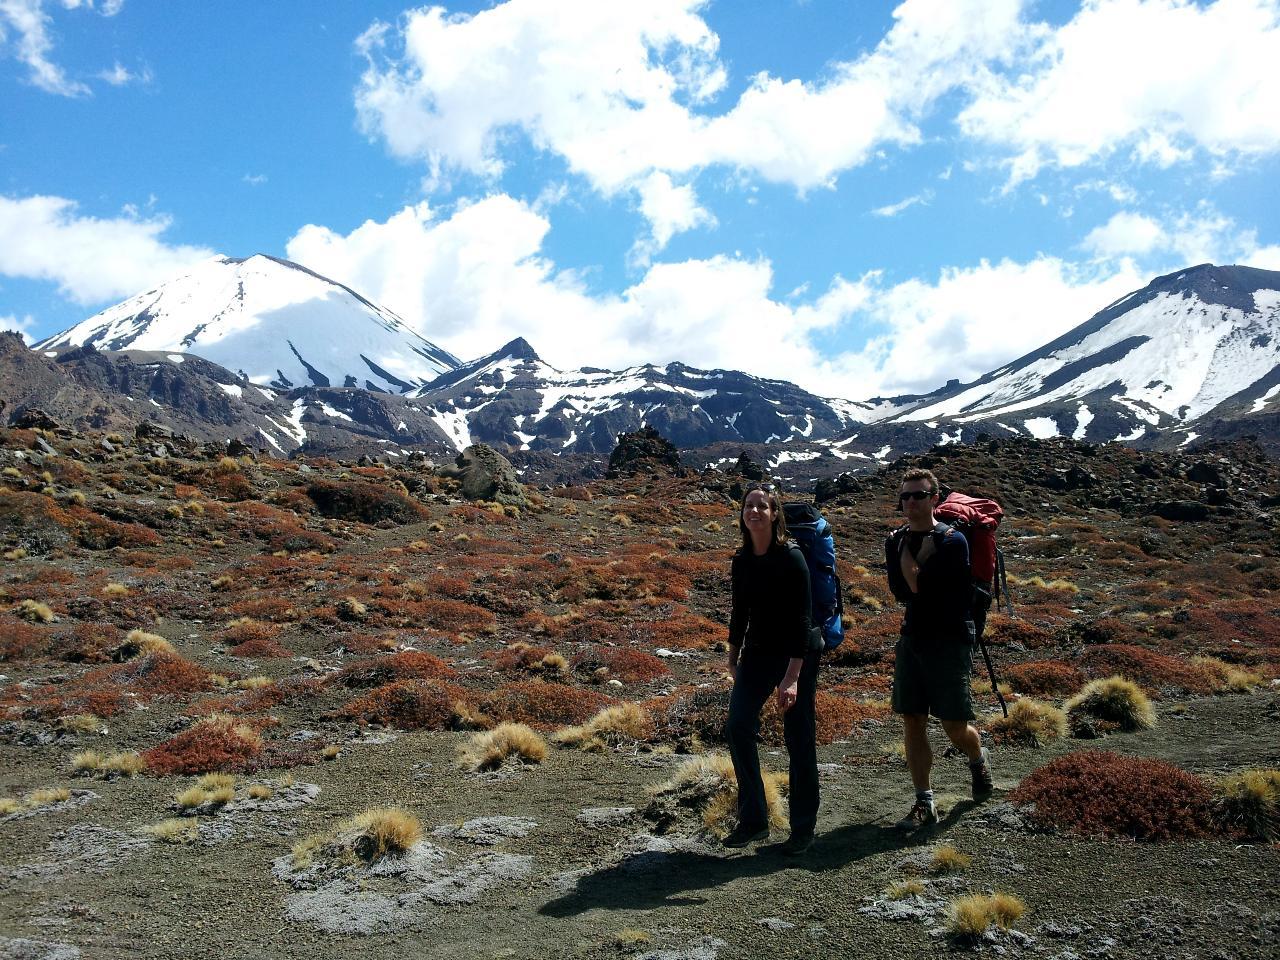 Tongariro Crossing 1 Day Guided Walk - Private